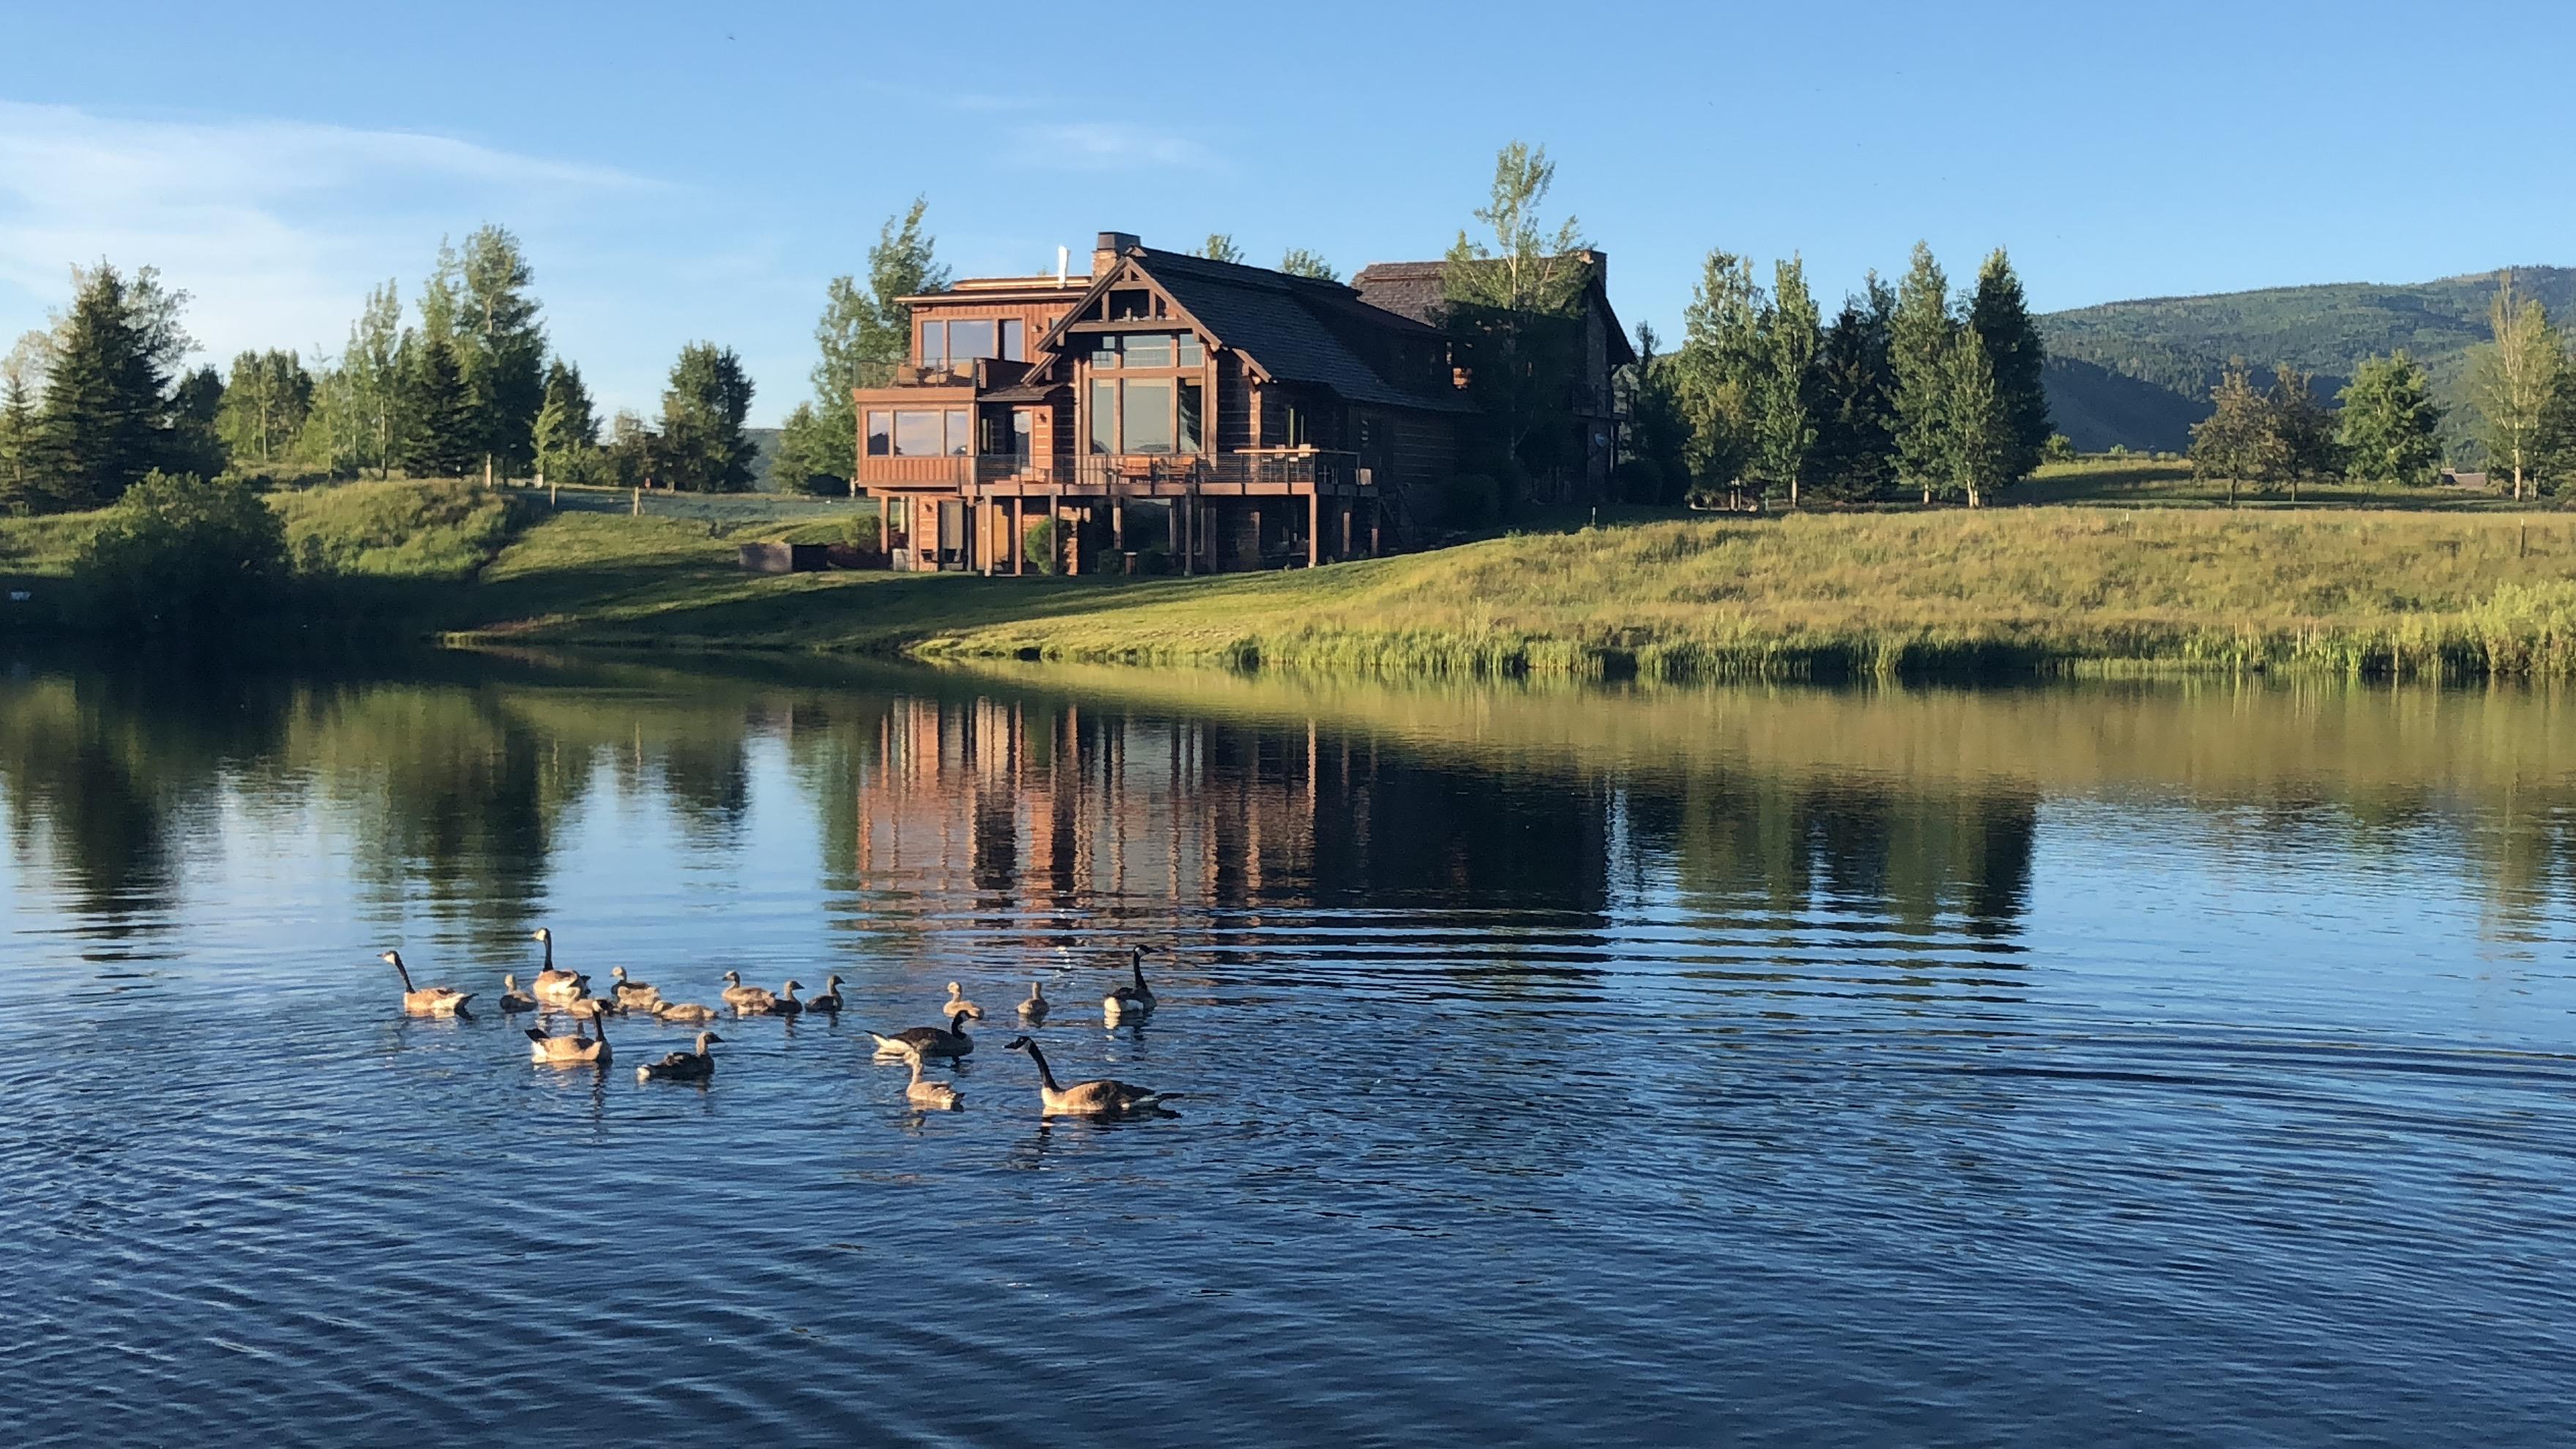 Across the pond